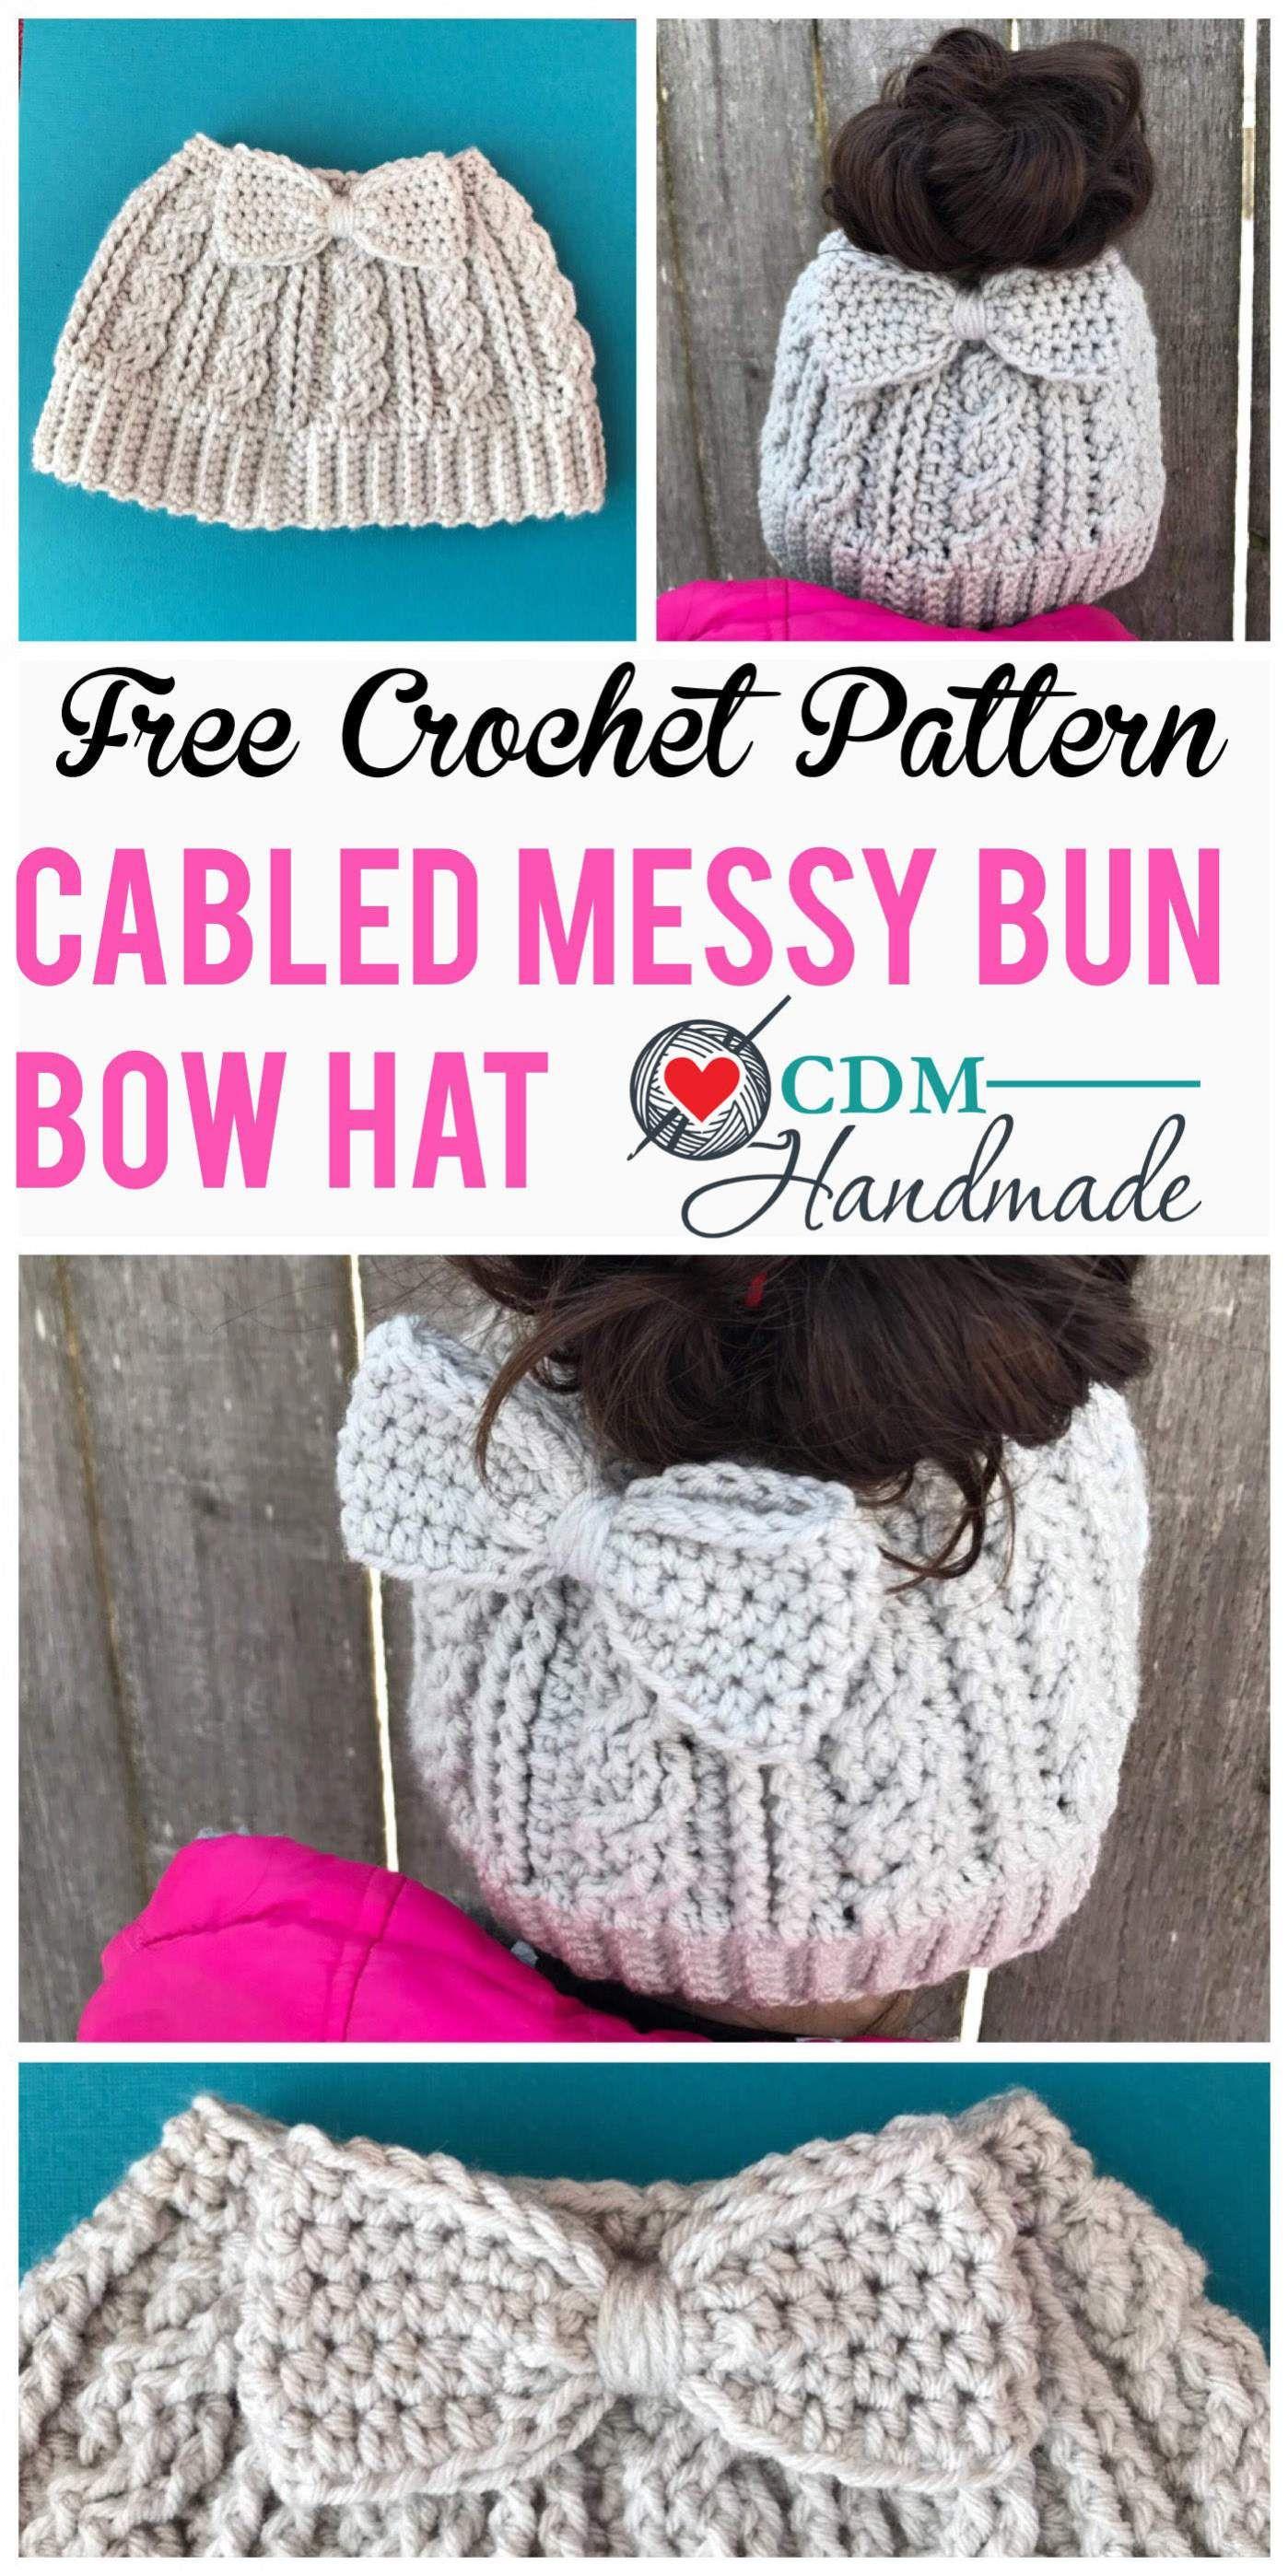 cabled messy bun bow hat pinterest | Puff stitch crochet | Pinterest ...